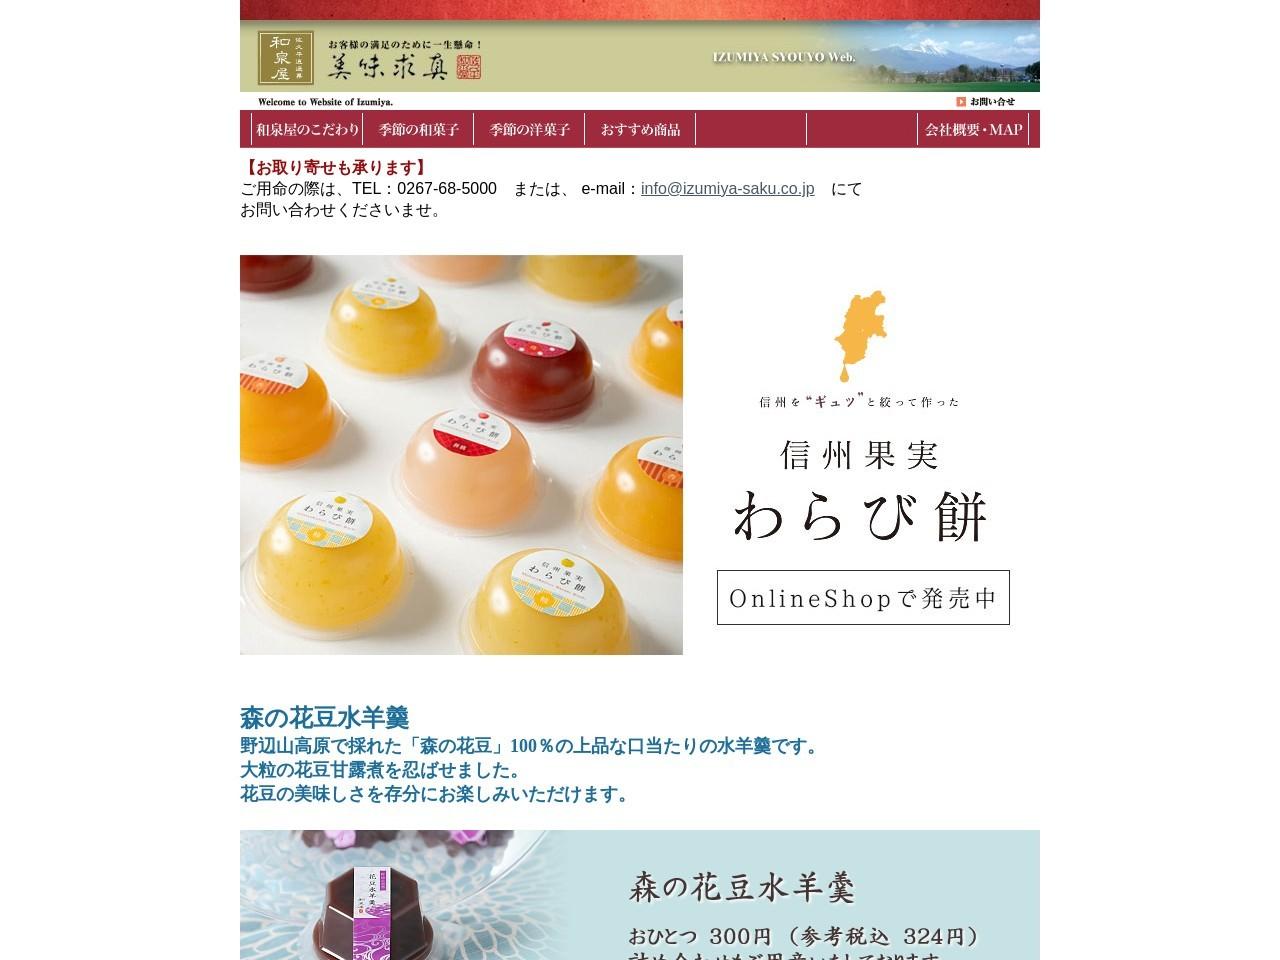 和泉屋菓子店/ツルヤ佐久中央店